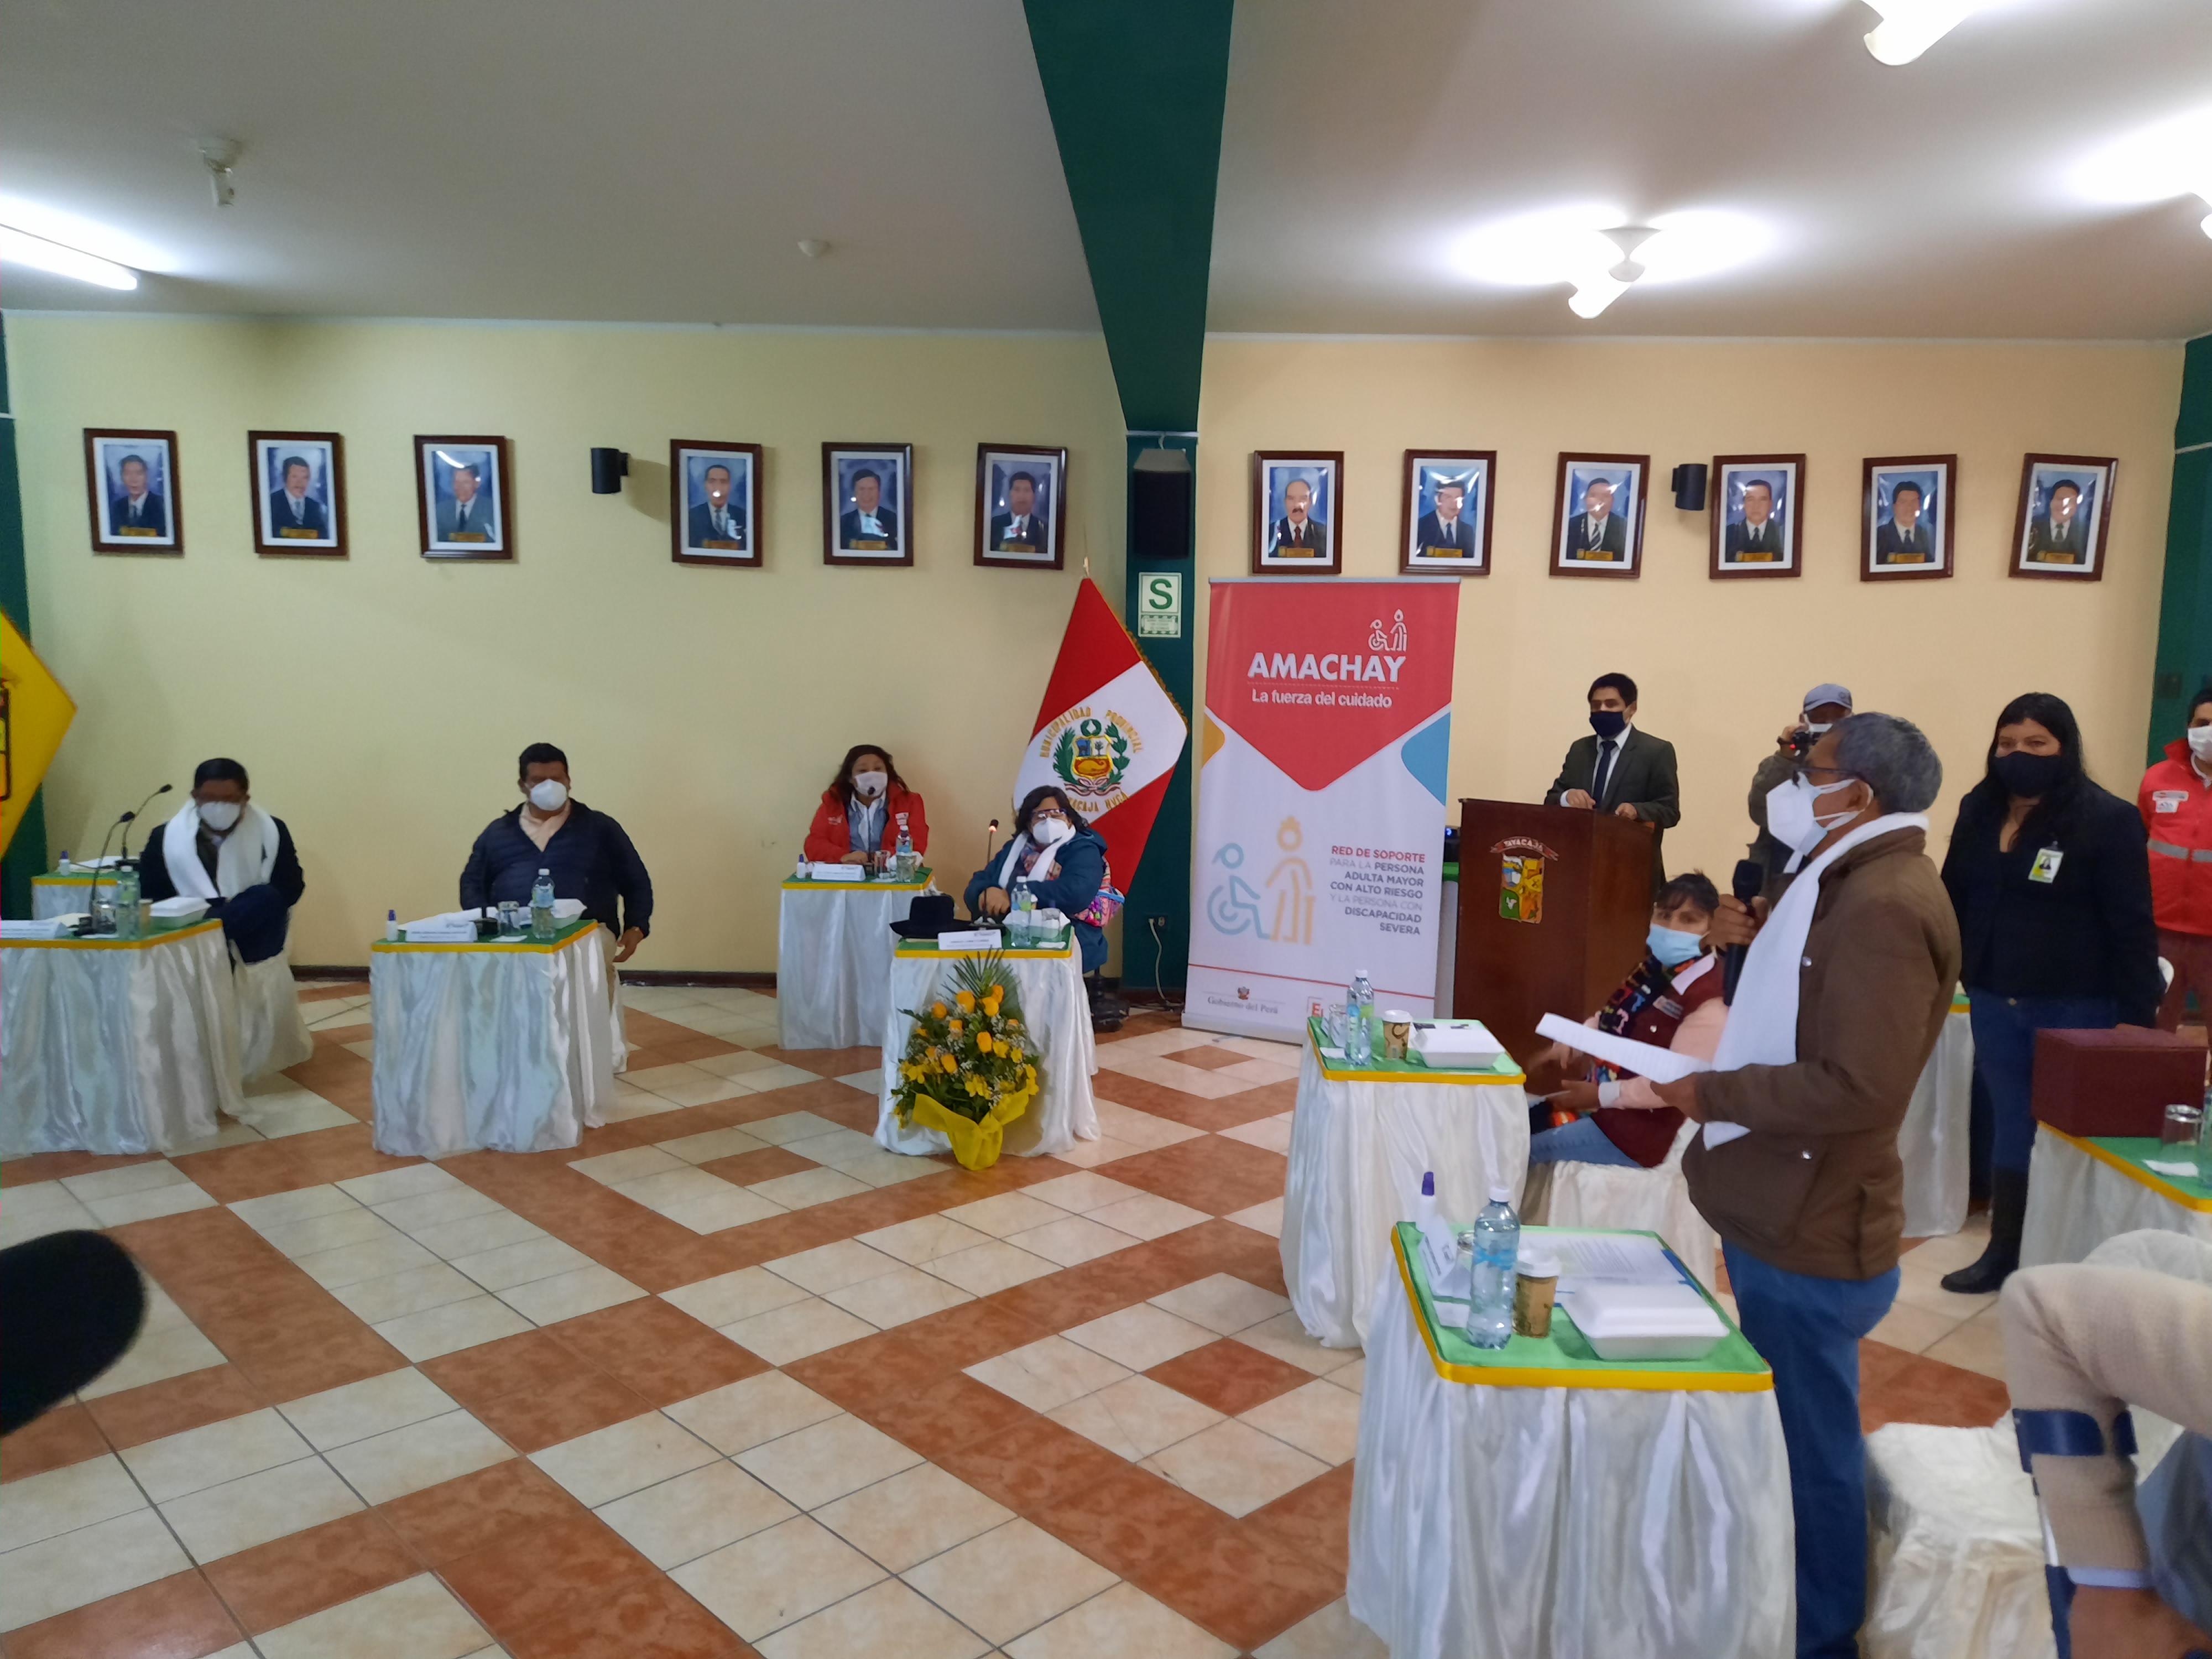 ALCALDE CAYLLAHUA LLEGÓ HASTA TAYACAJA PARA EXPONER PROGRAMA AMACHAY